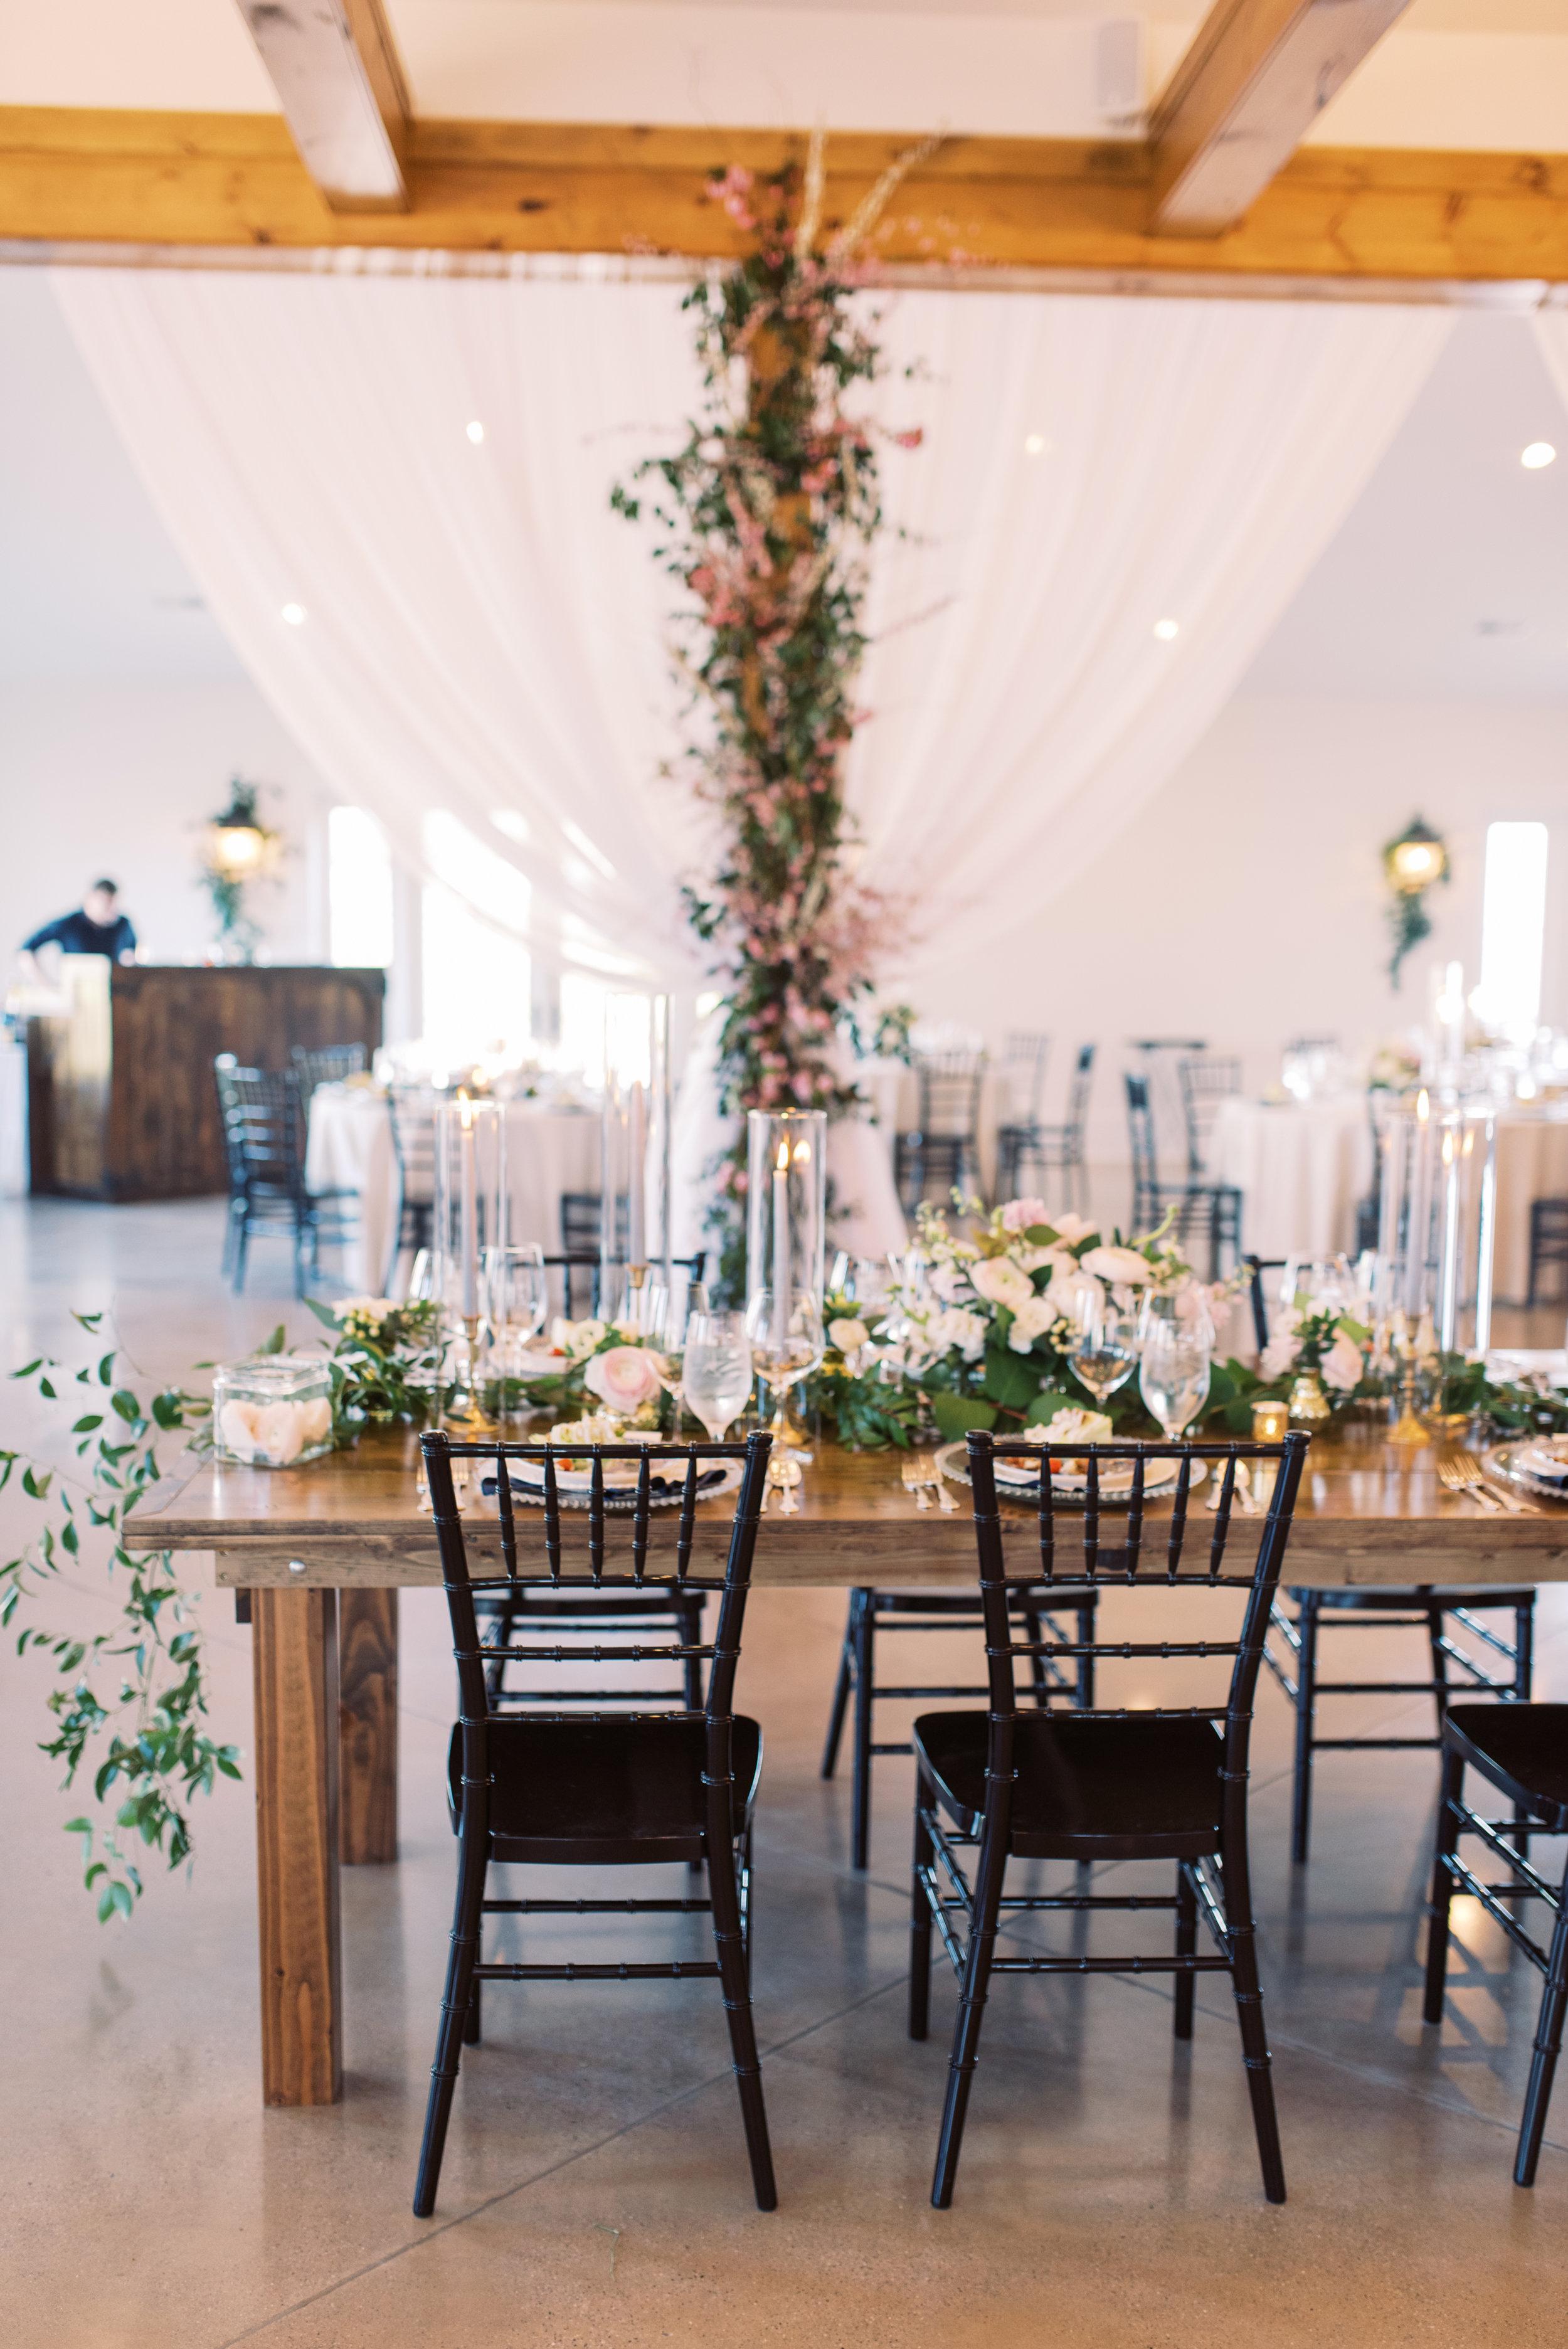 Meredith_Cody_marblegate_Farm_Wedding_Knoxville_TN_Abigail_Malone_Photography-587.jpg